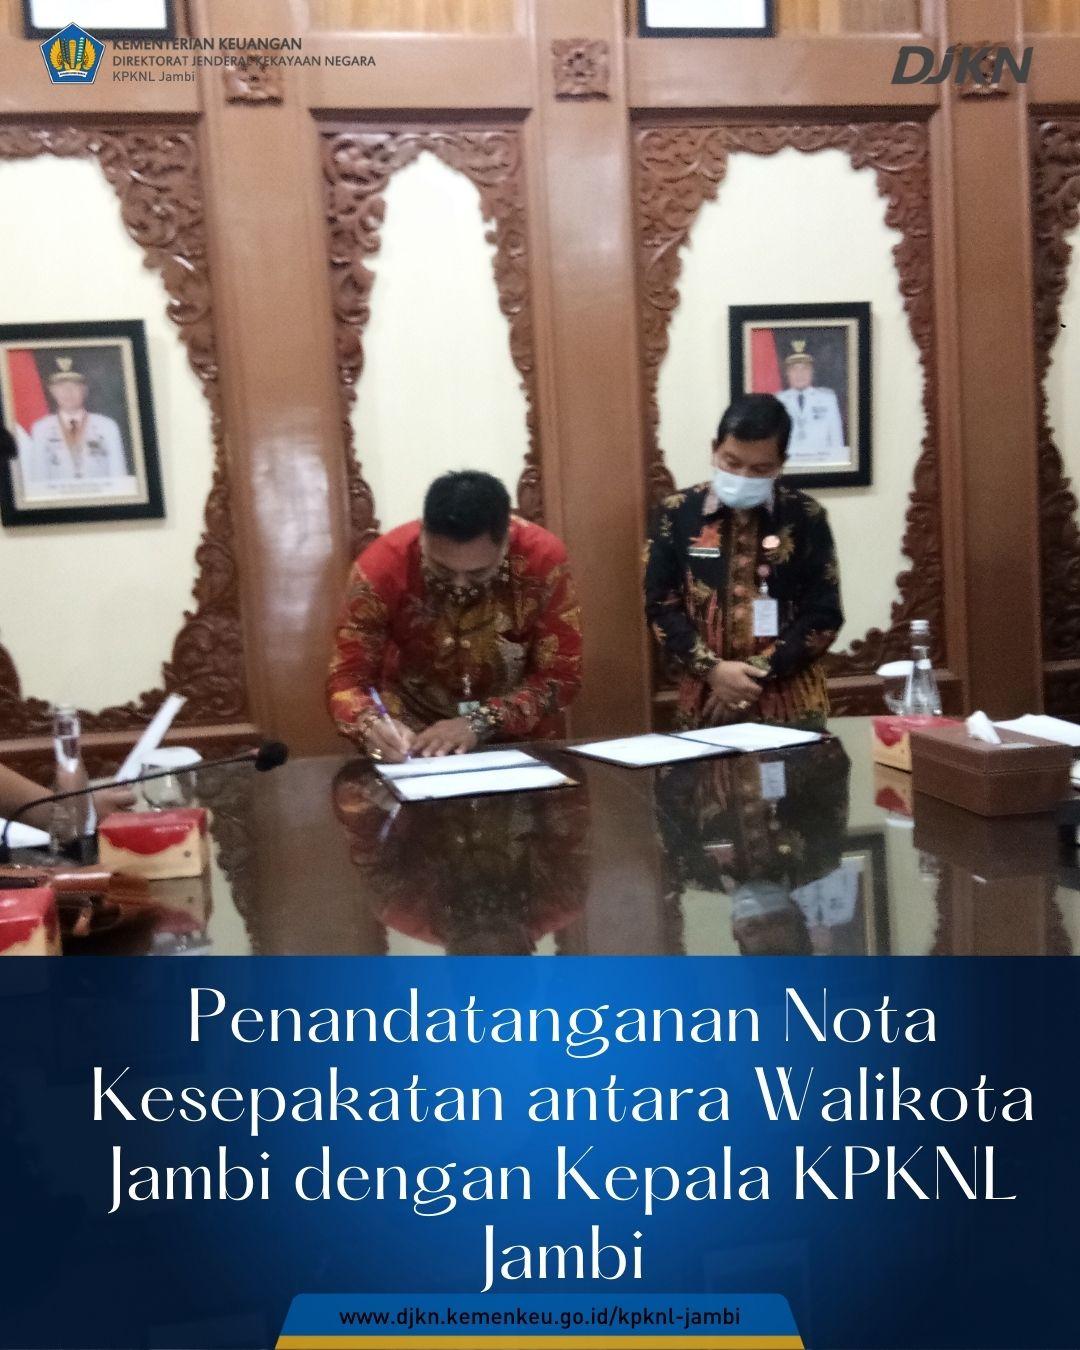 Penandatanganan Nota Kesepakatan antara Walikota Jambi dengan Kepala KPKNL Jambi